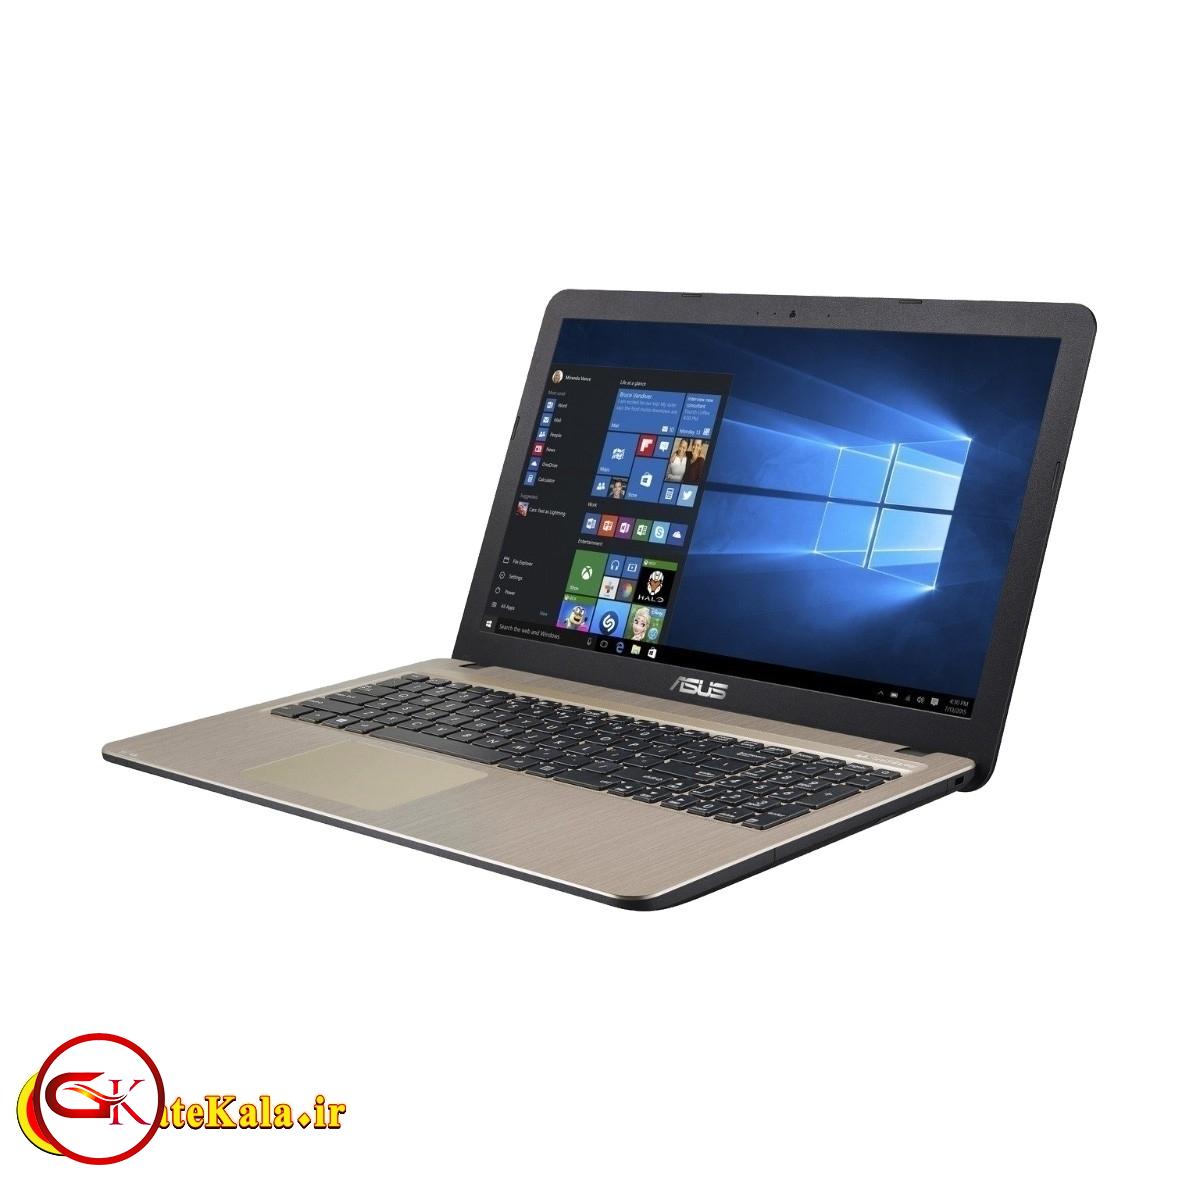 Asus X540UB | CPU i7 7500U | 1TB HDD | RAM 8GB | MX110 2G